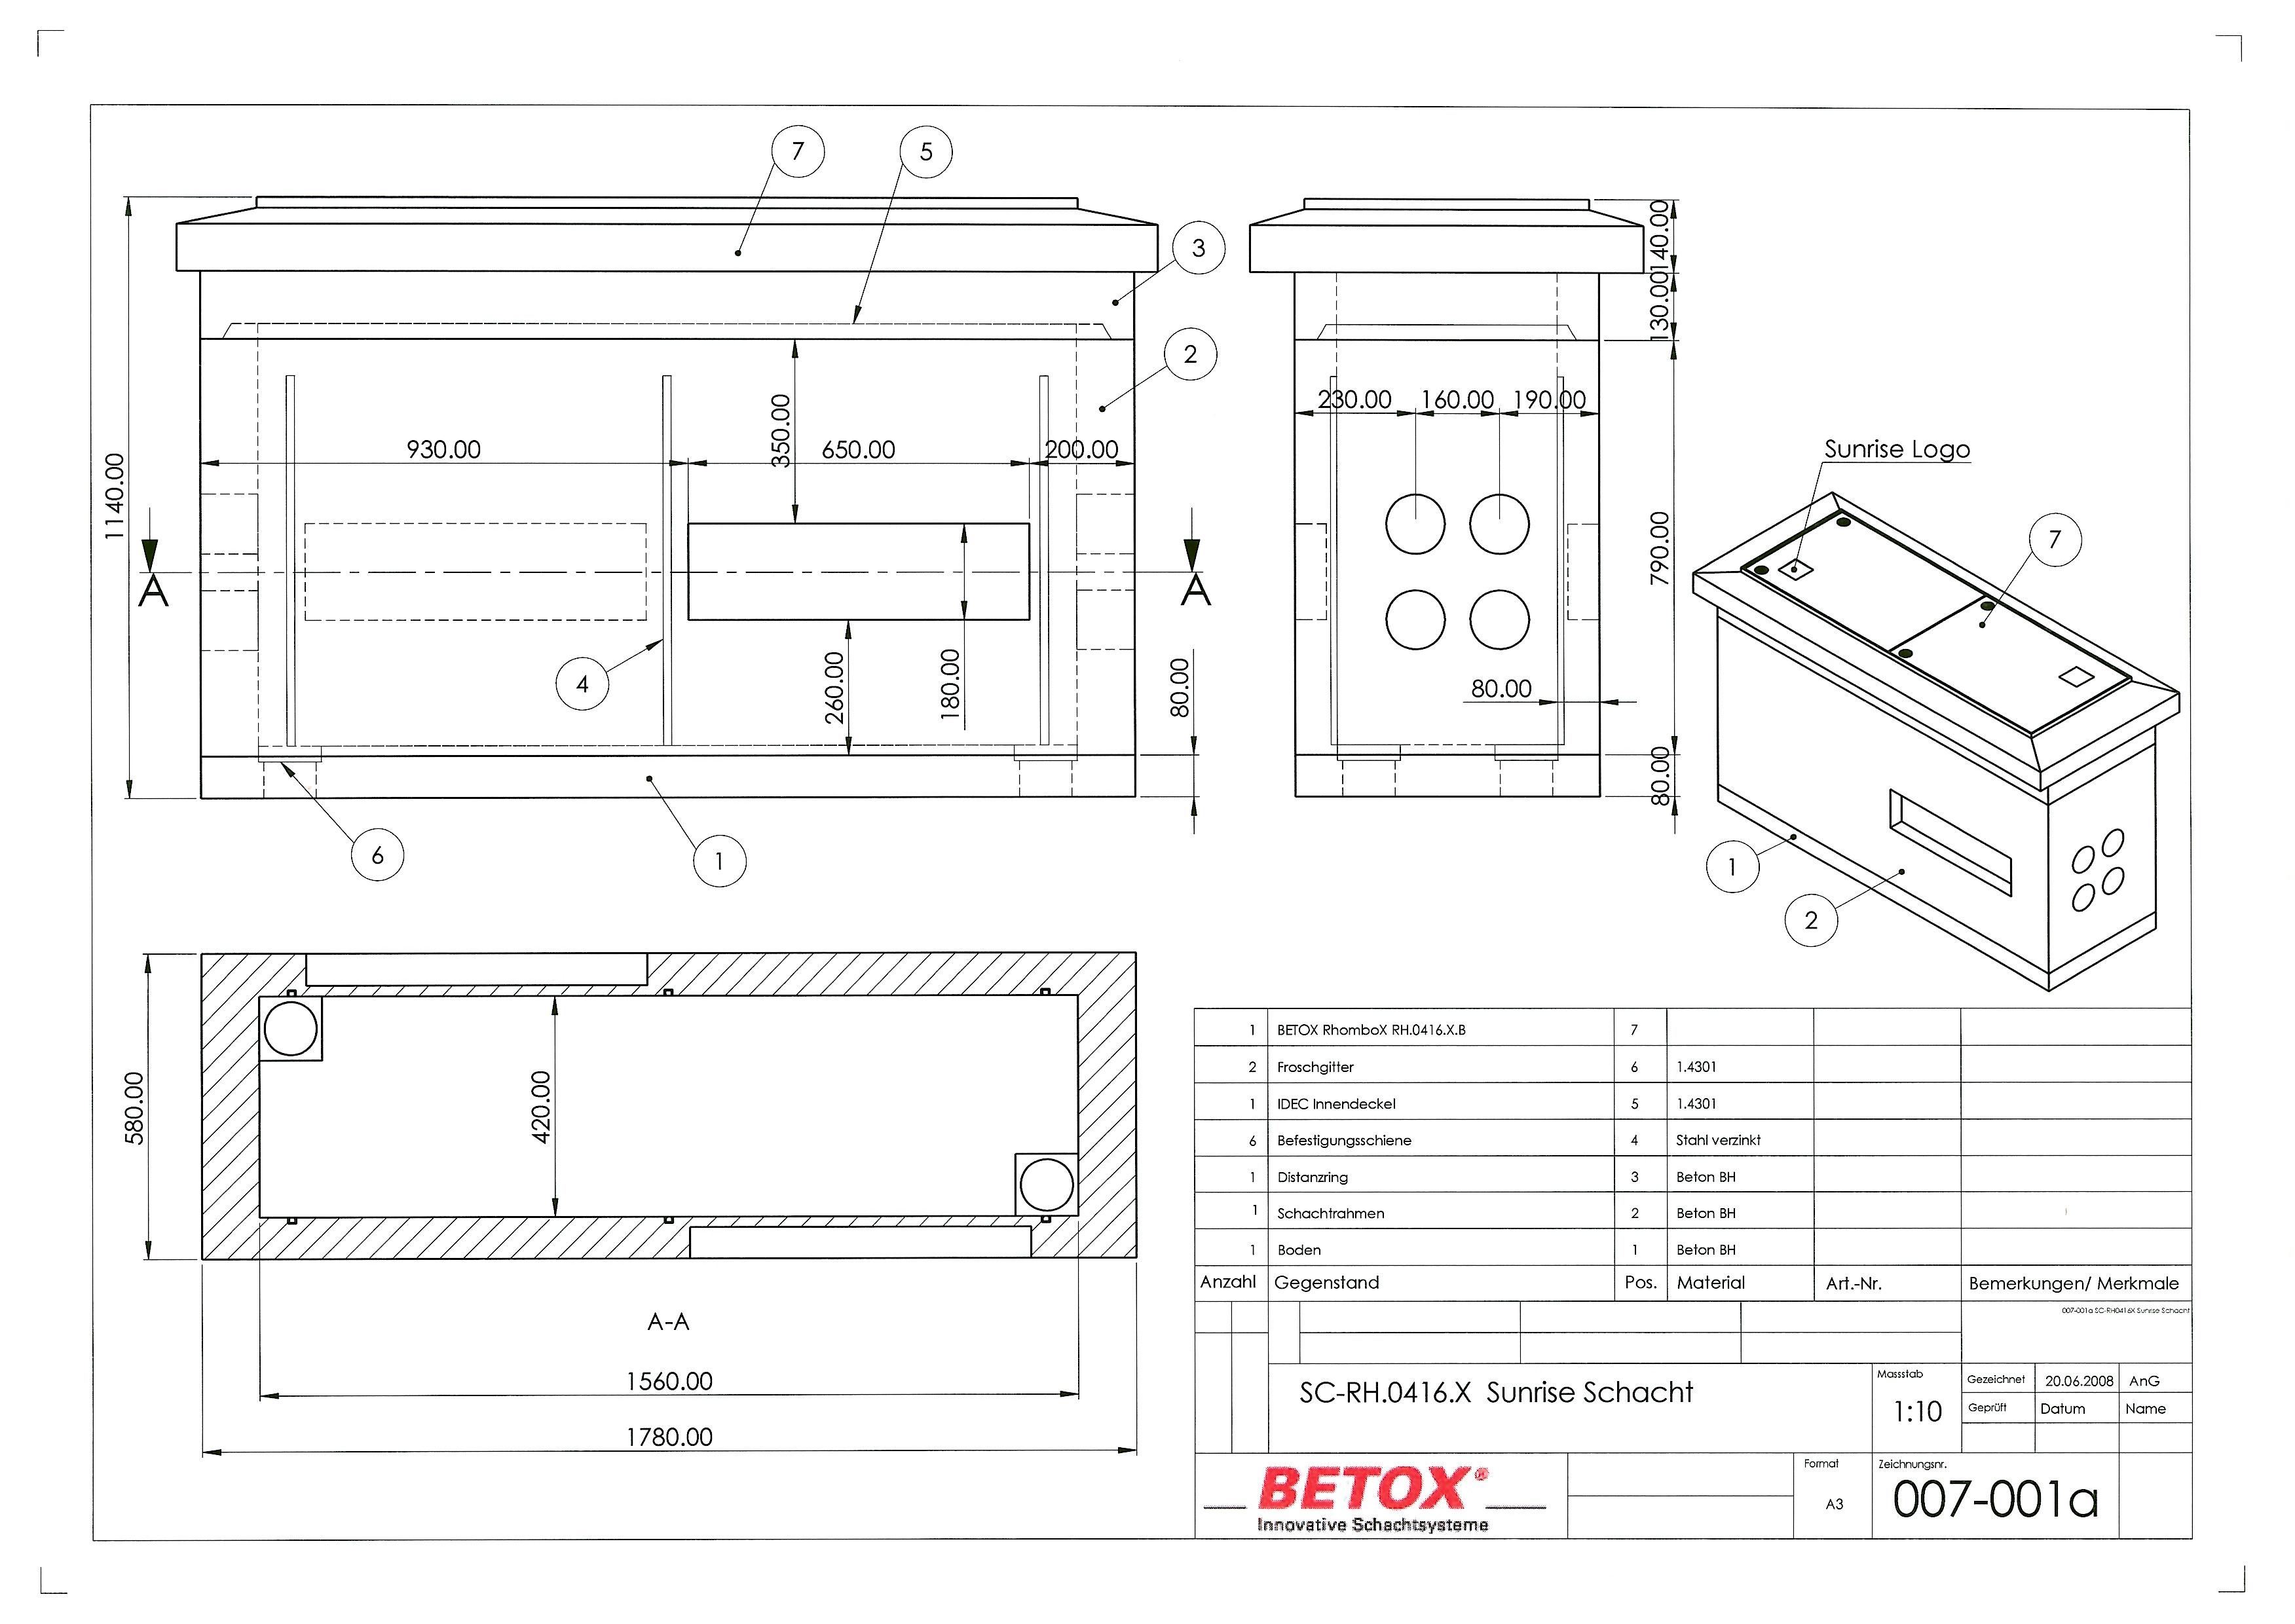 SC-RH.0416.X.Sunrise RhomboX RH.0416.XB, Schacht D400 Innenmass 42x156, Distanzring, mit Boden